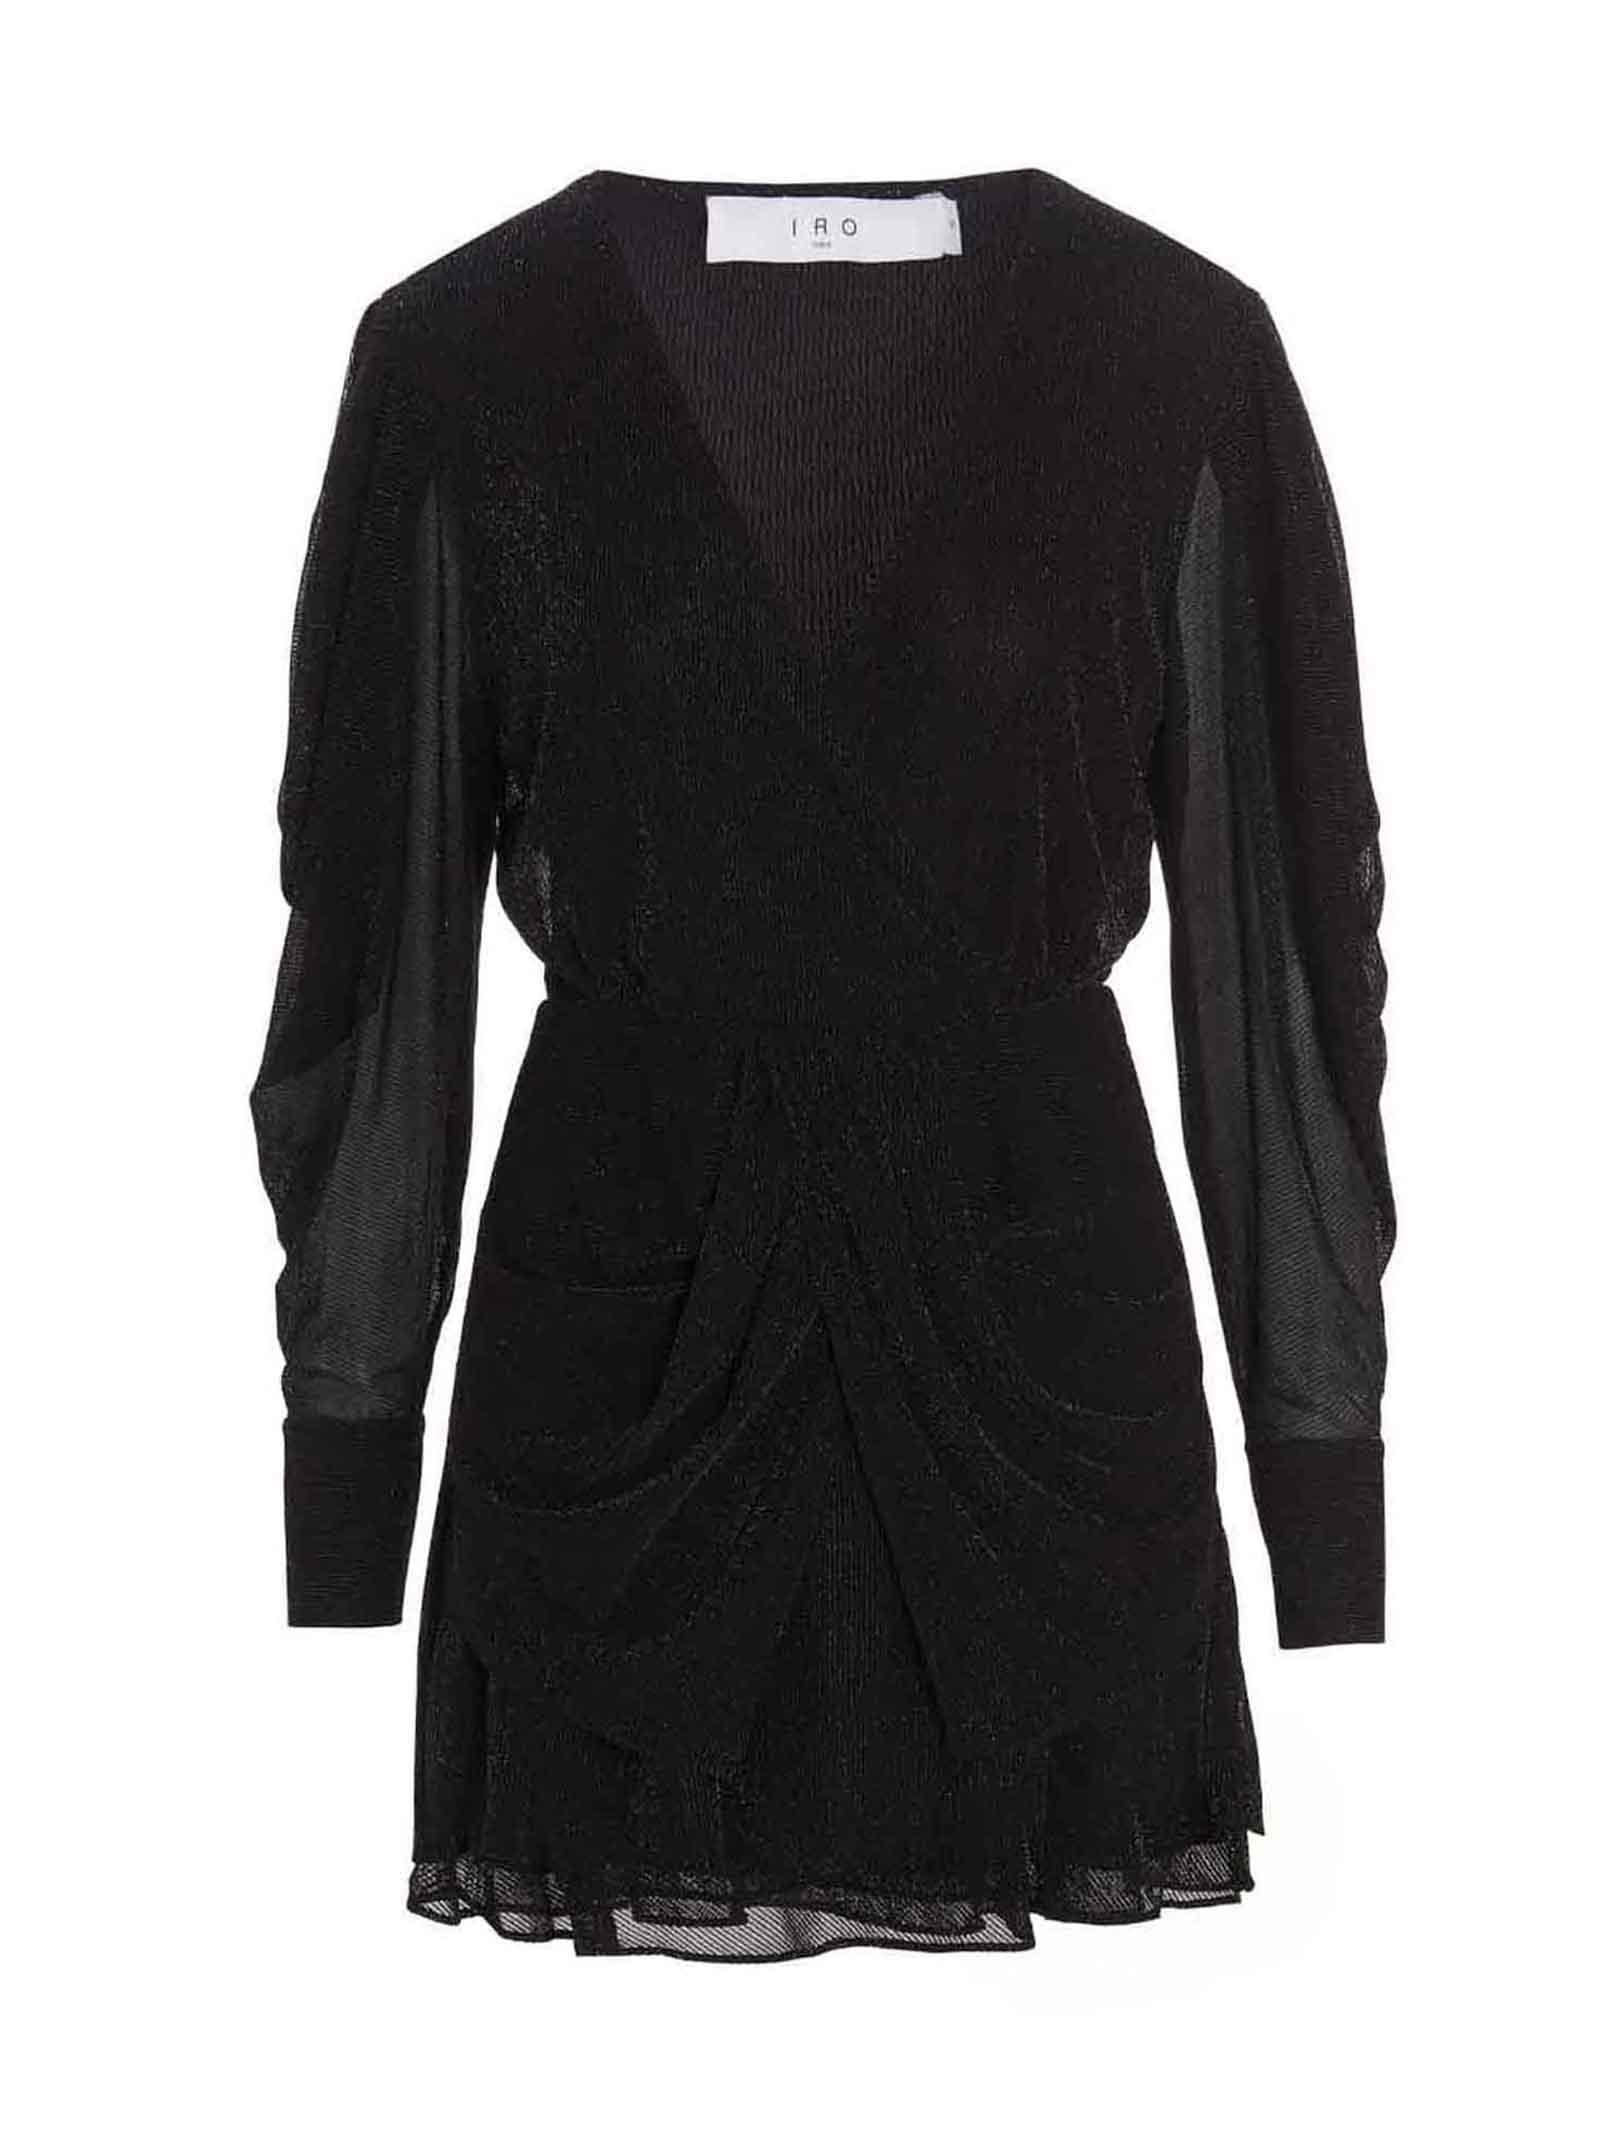 Buy Iro breja Dress online, shop IRO with free shipping